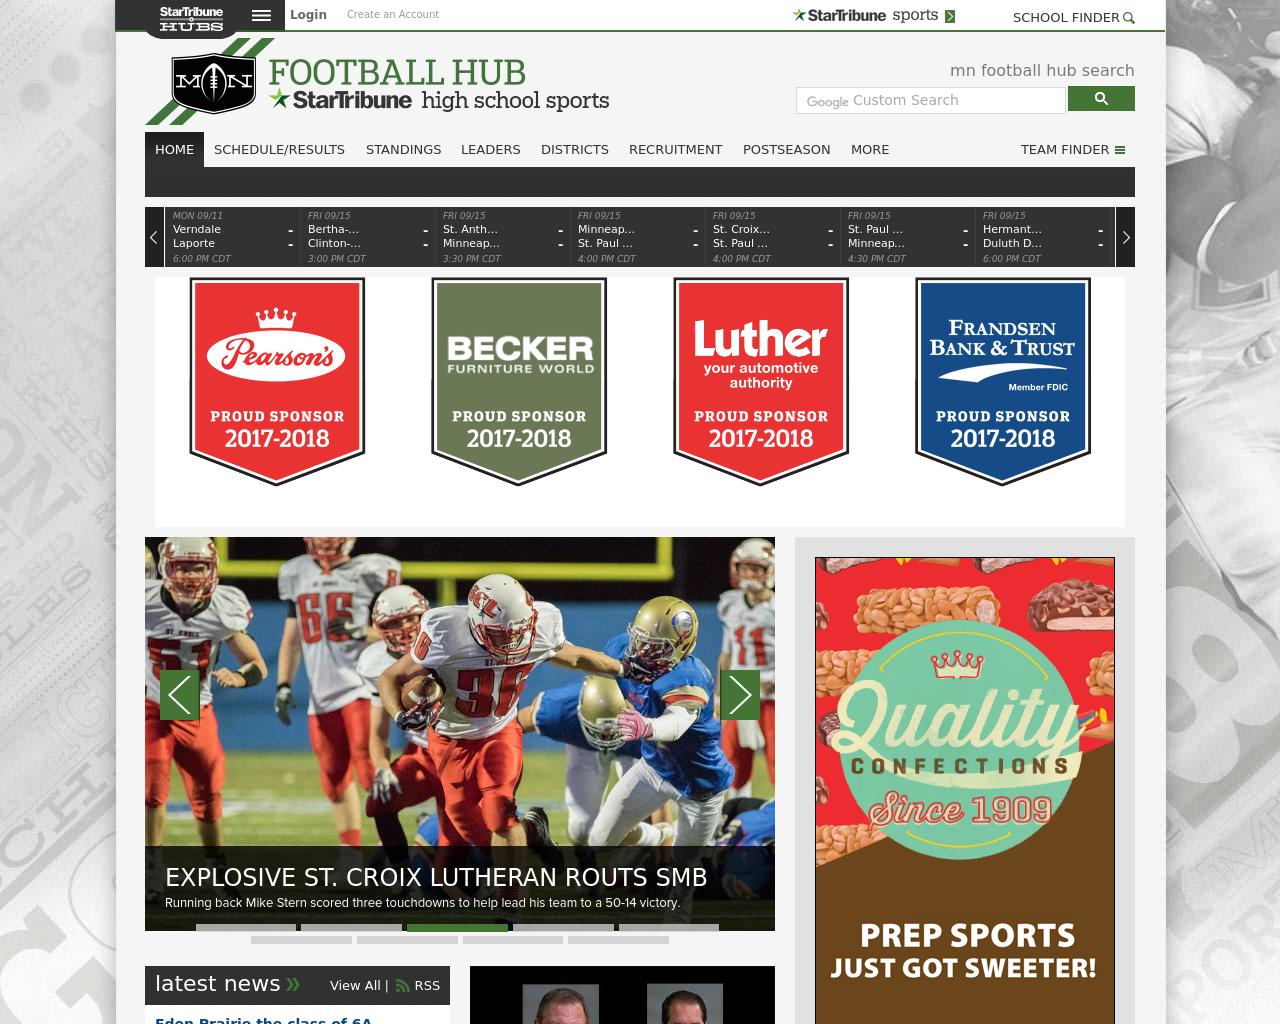 MN-Football-Hub-Advertising-Reviews-Pricing